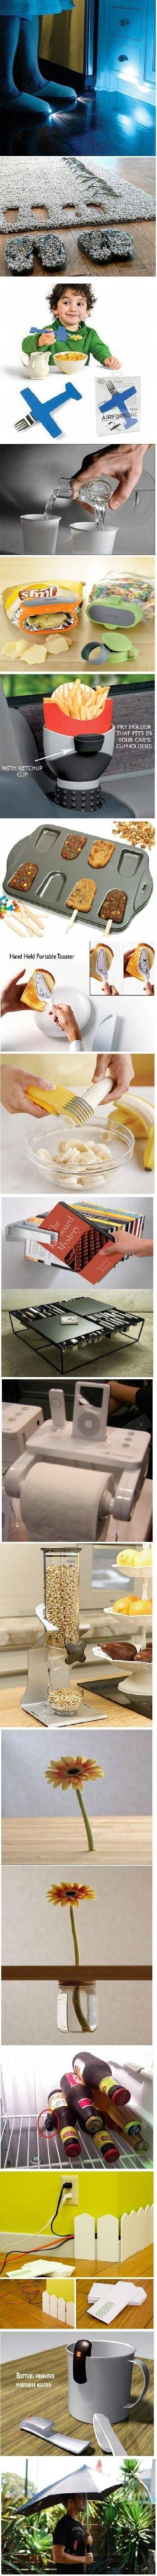 Simple but brilliant ideas.